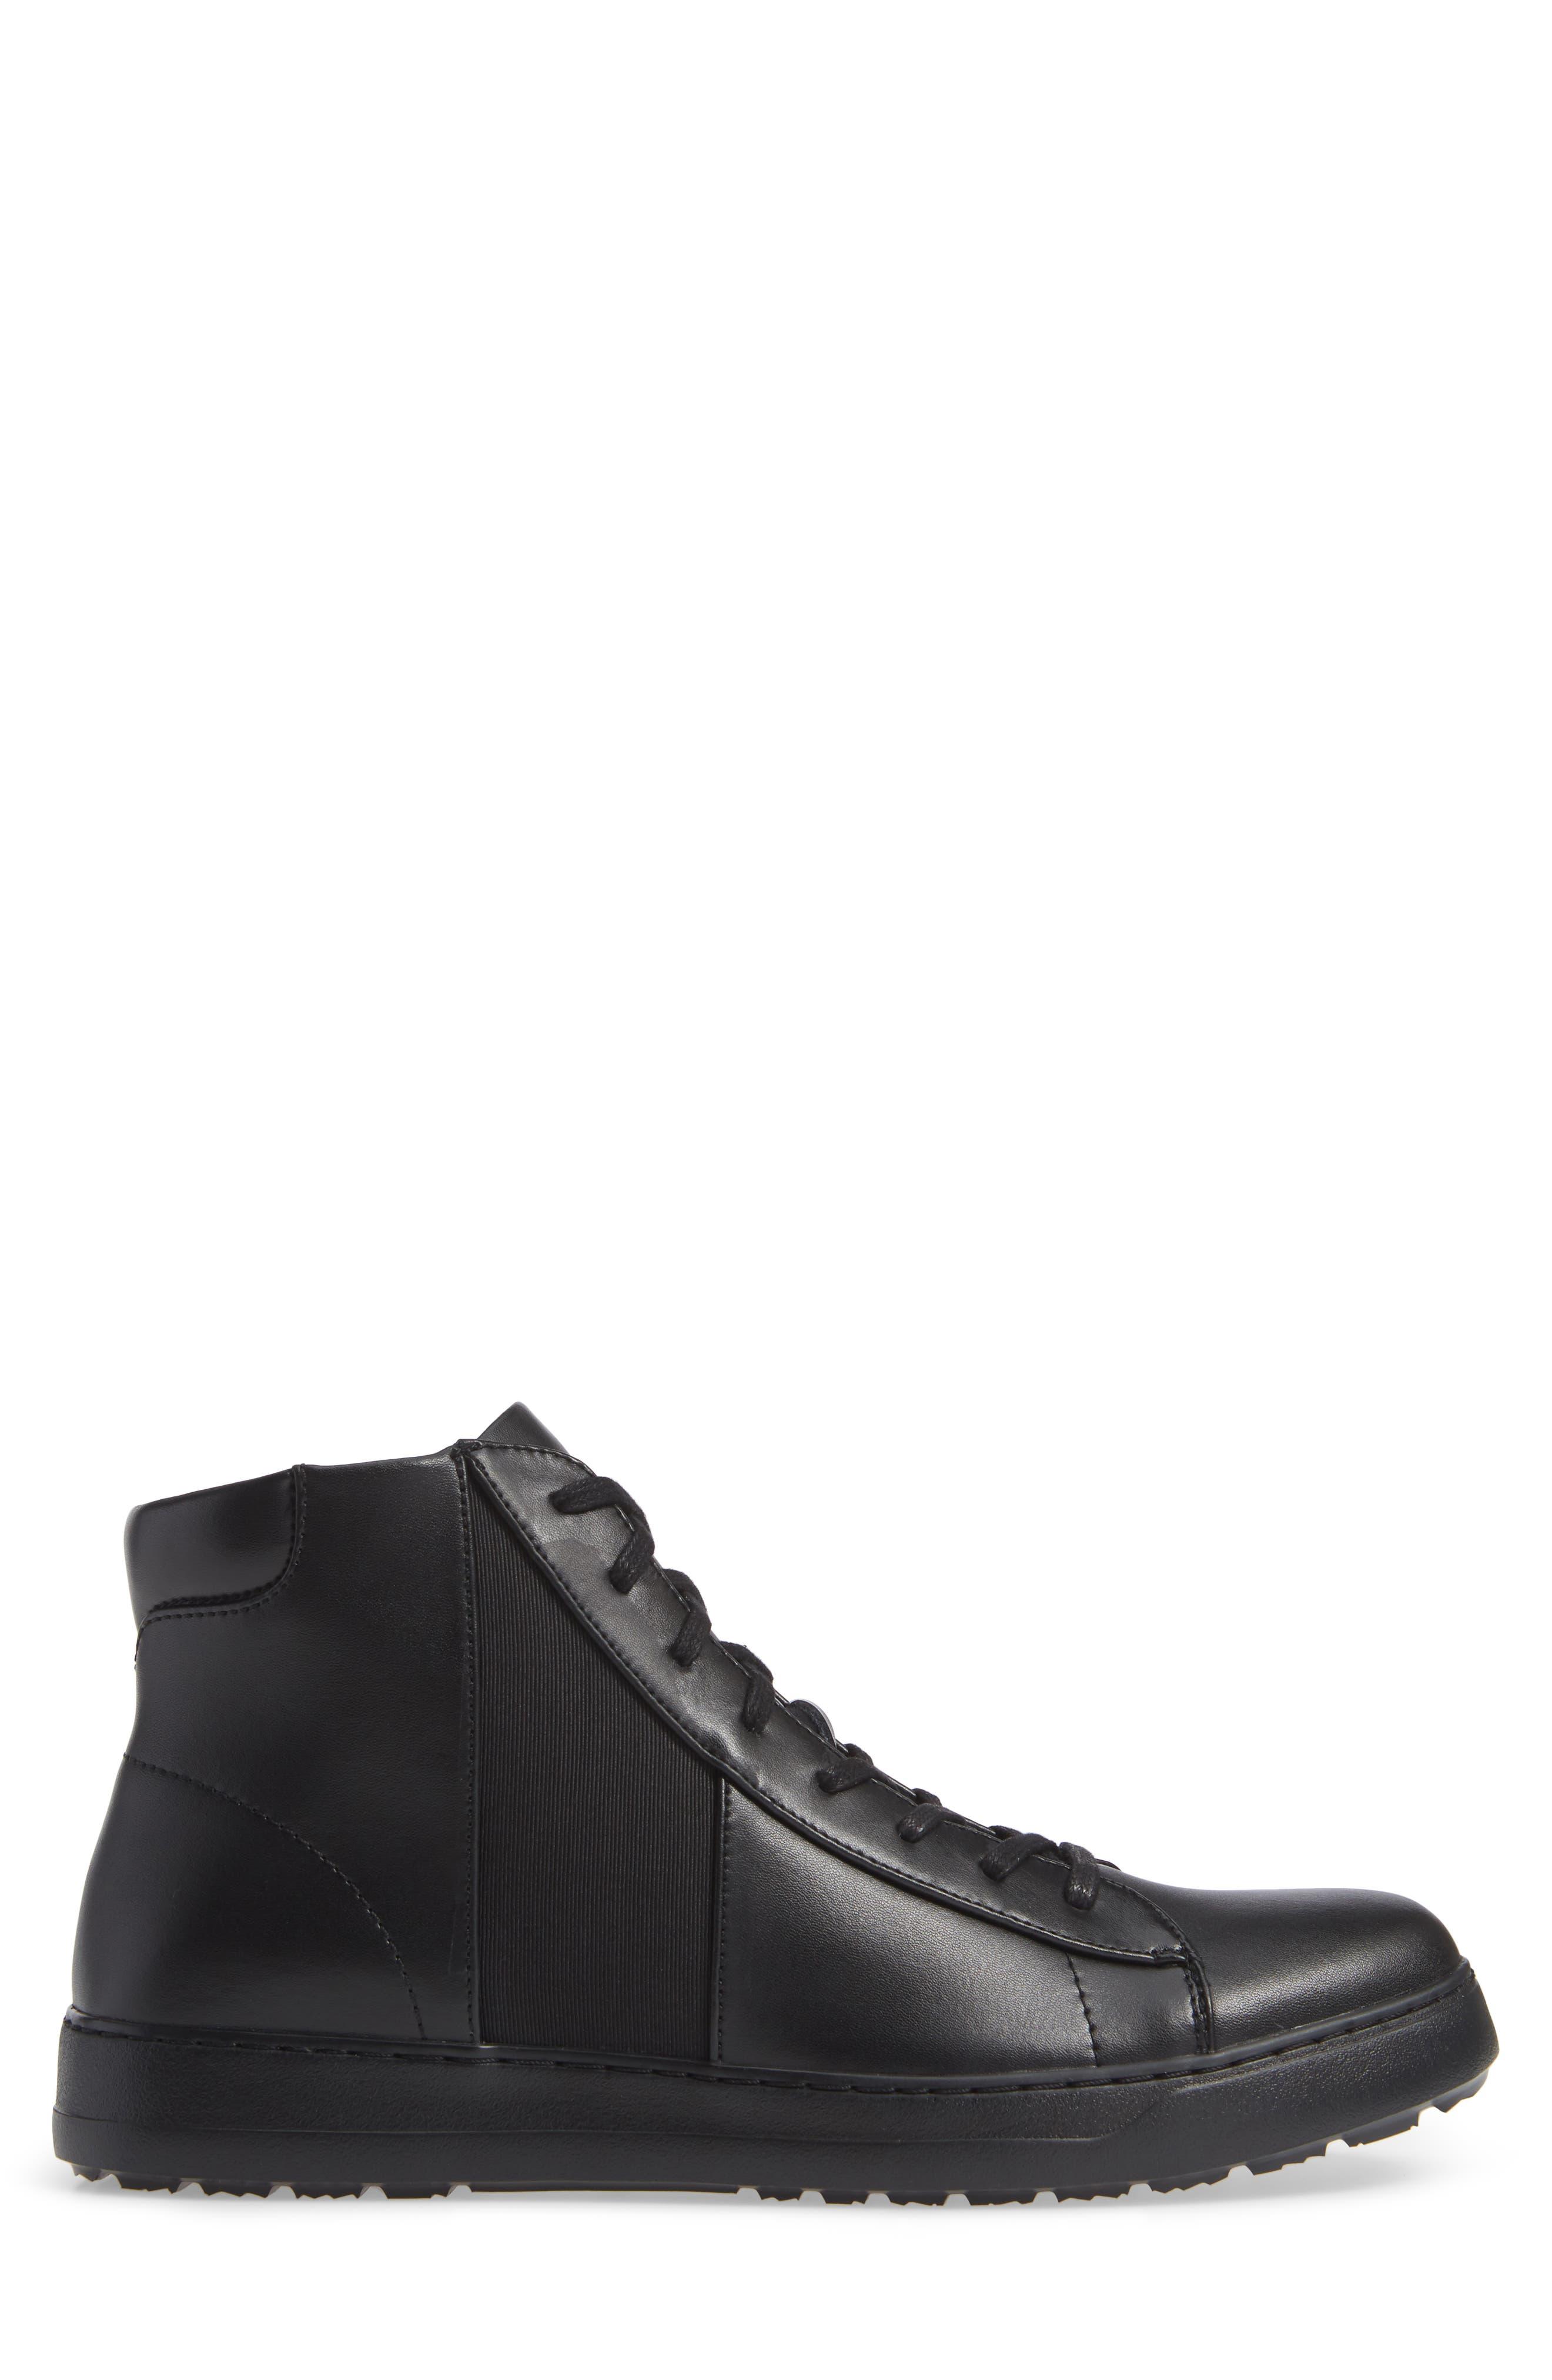 Salvador High Top Sneaker,                             Alternate thumbnail 3, color,                             BLACK/ BLACK LEATHER